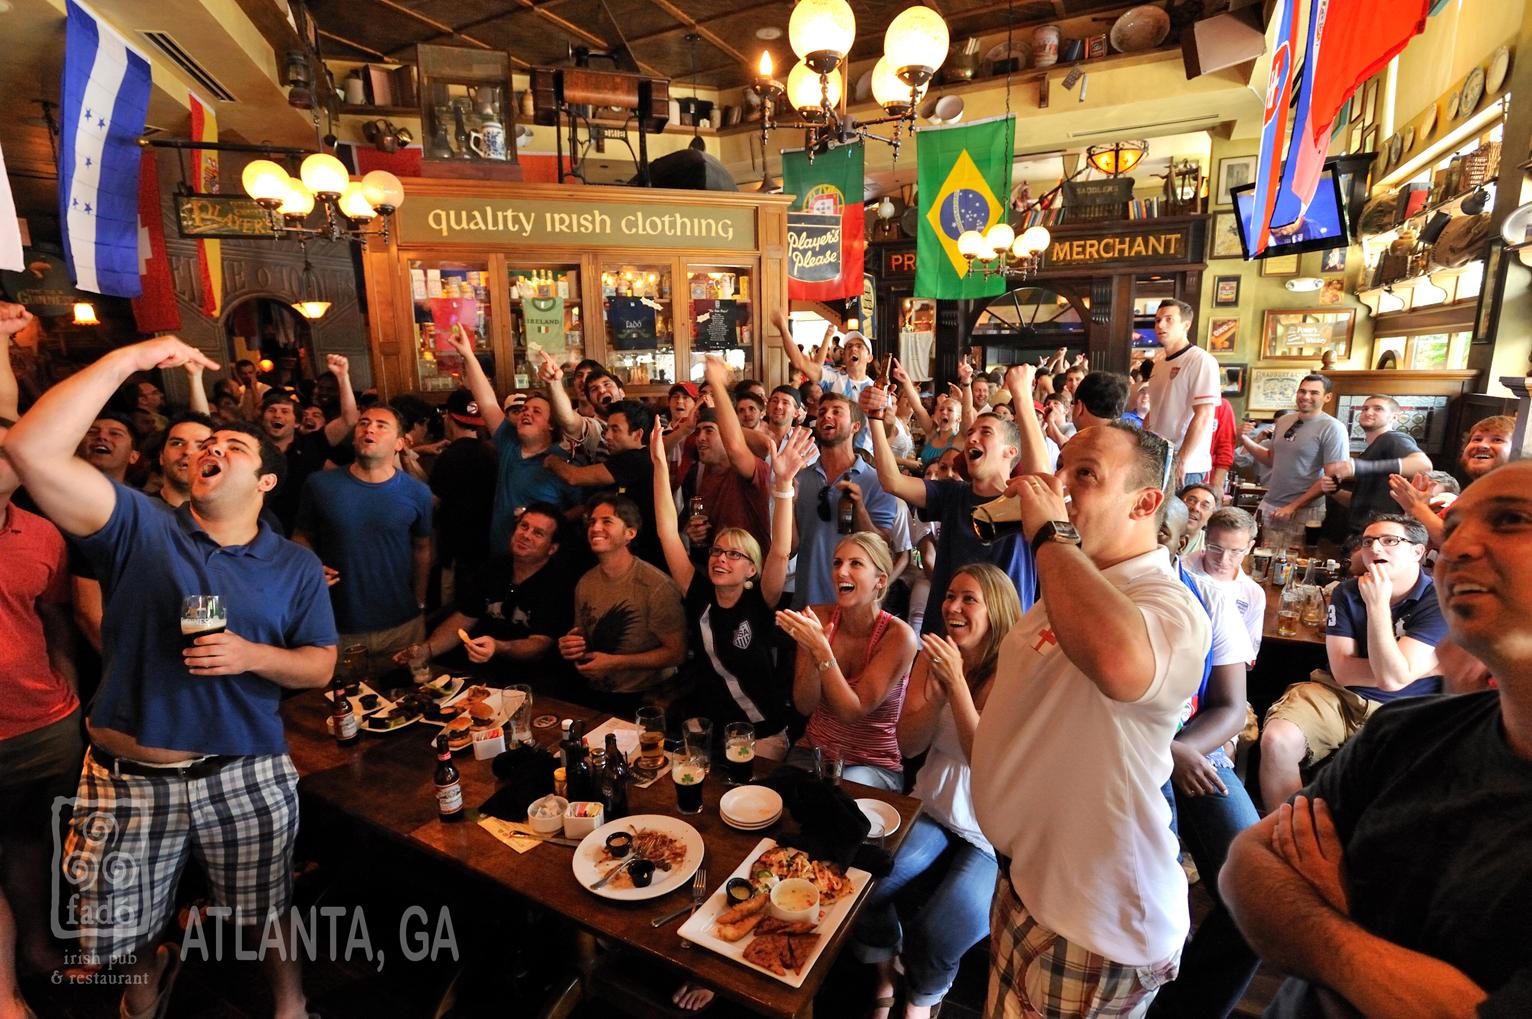 AtlantaFadosIrishPubCrowd.jpg